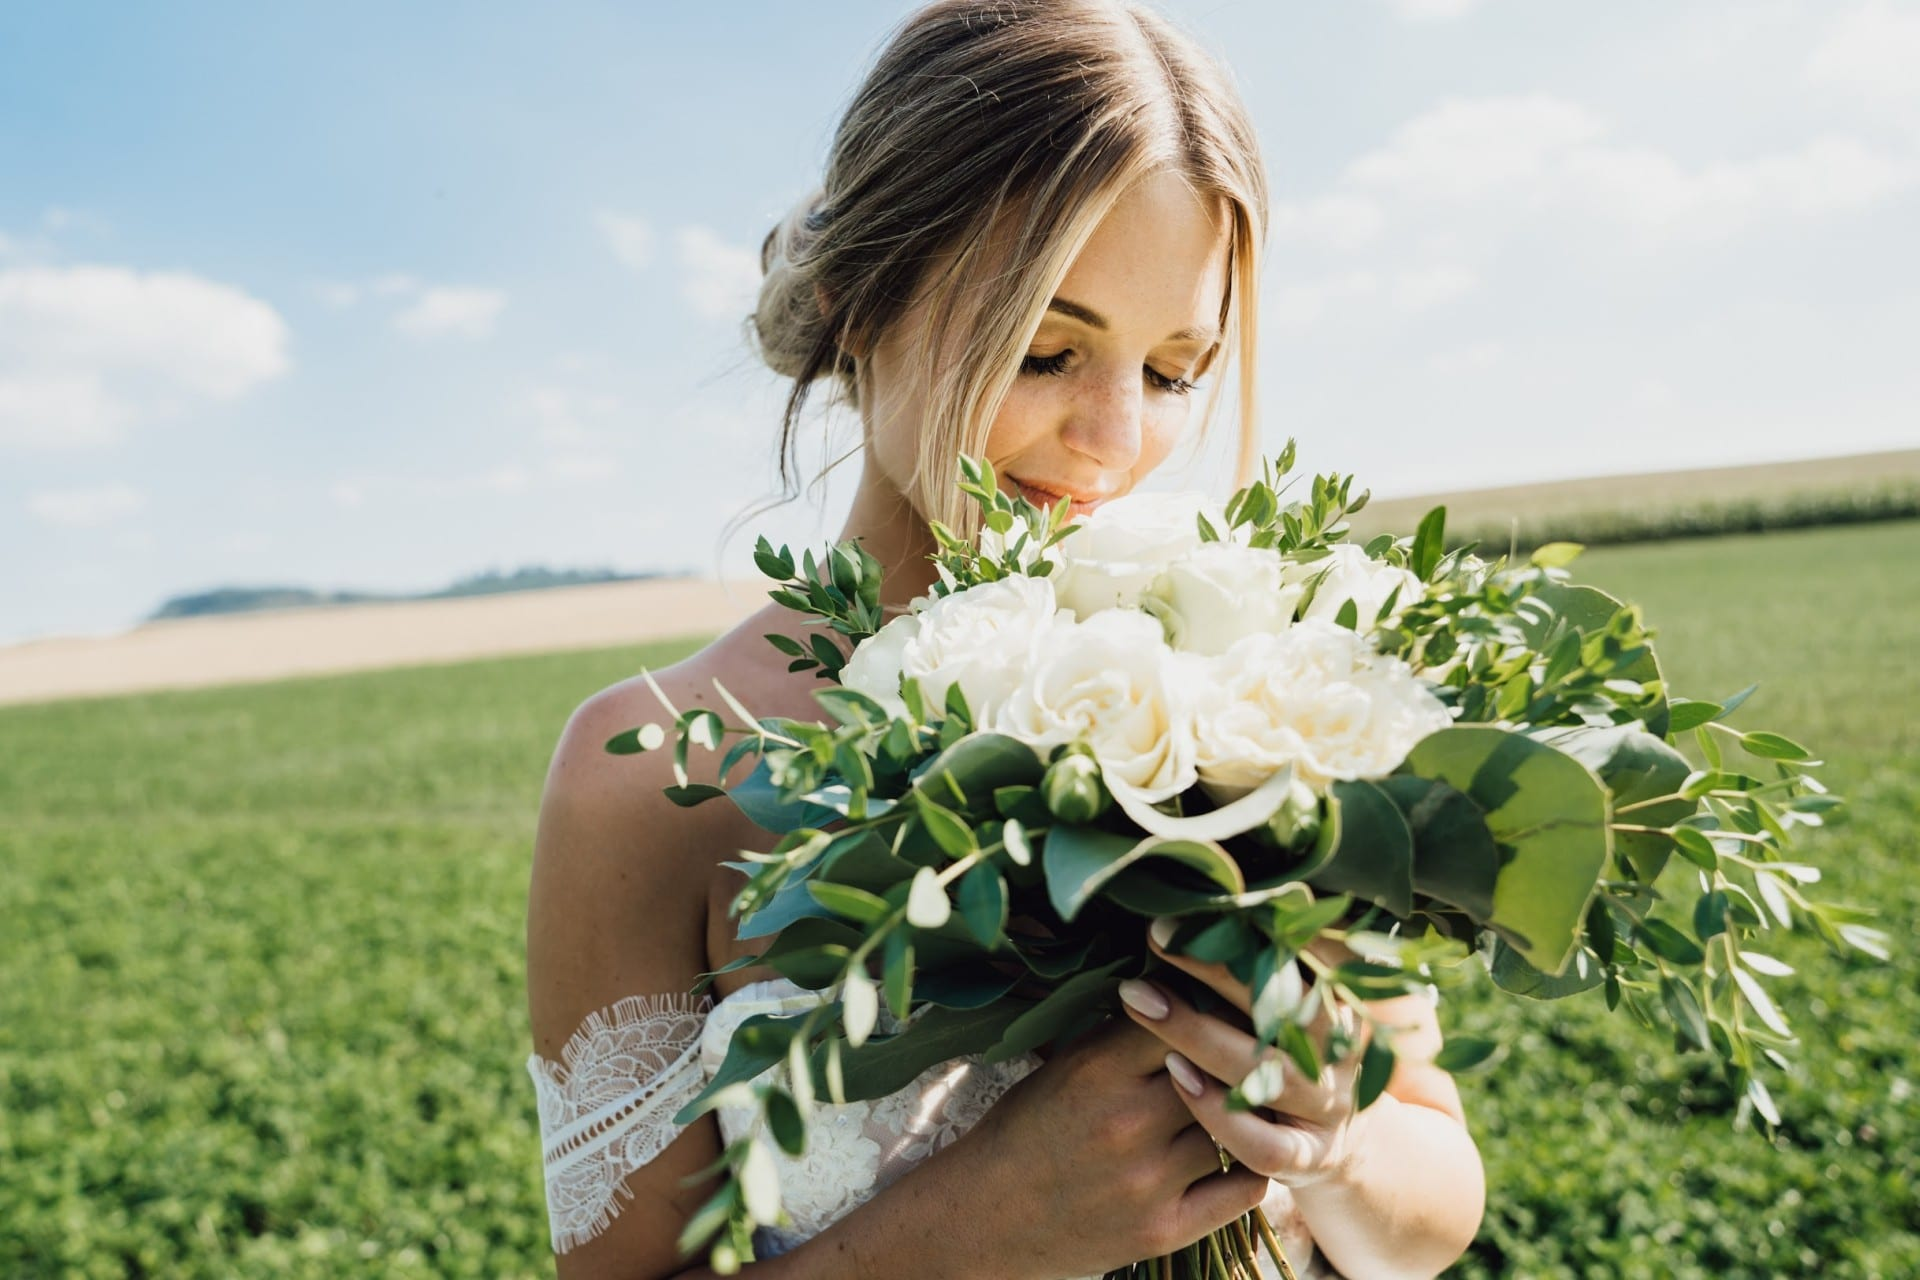 551-Contiphotography-Hochzeitsfotos-L1CVPqFi